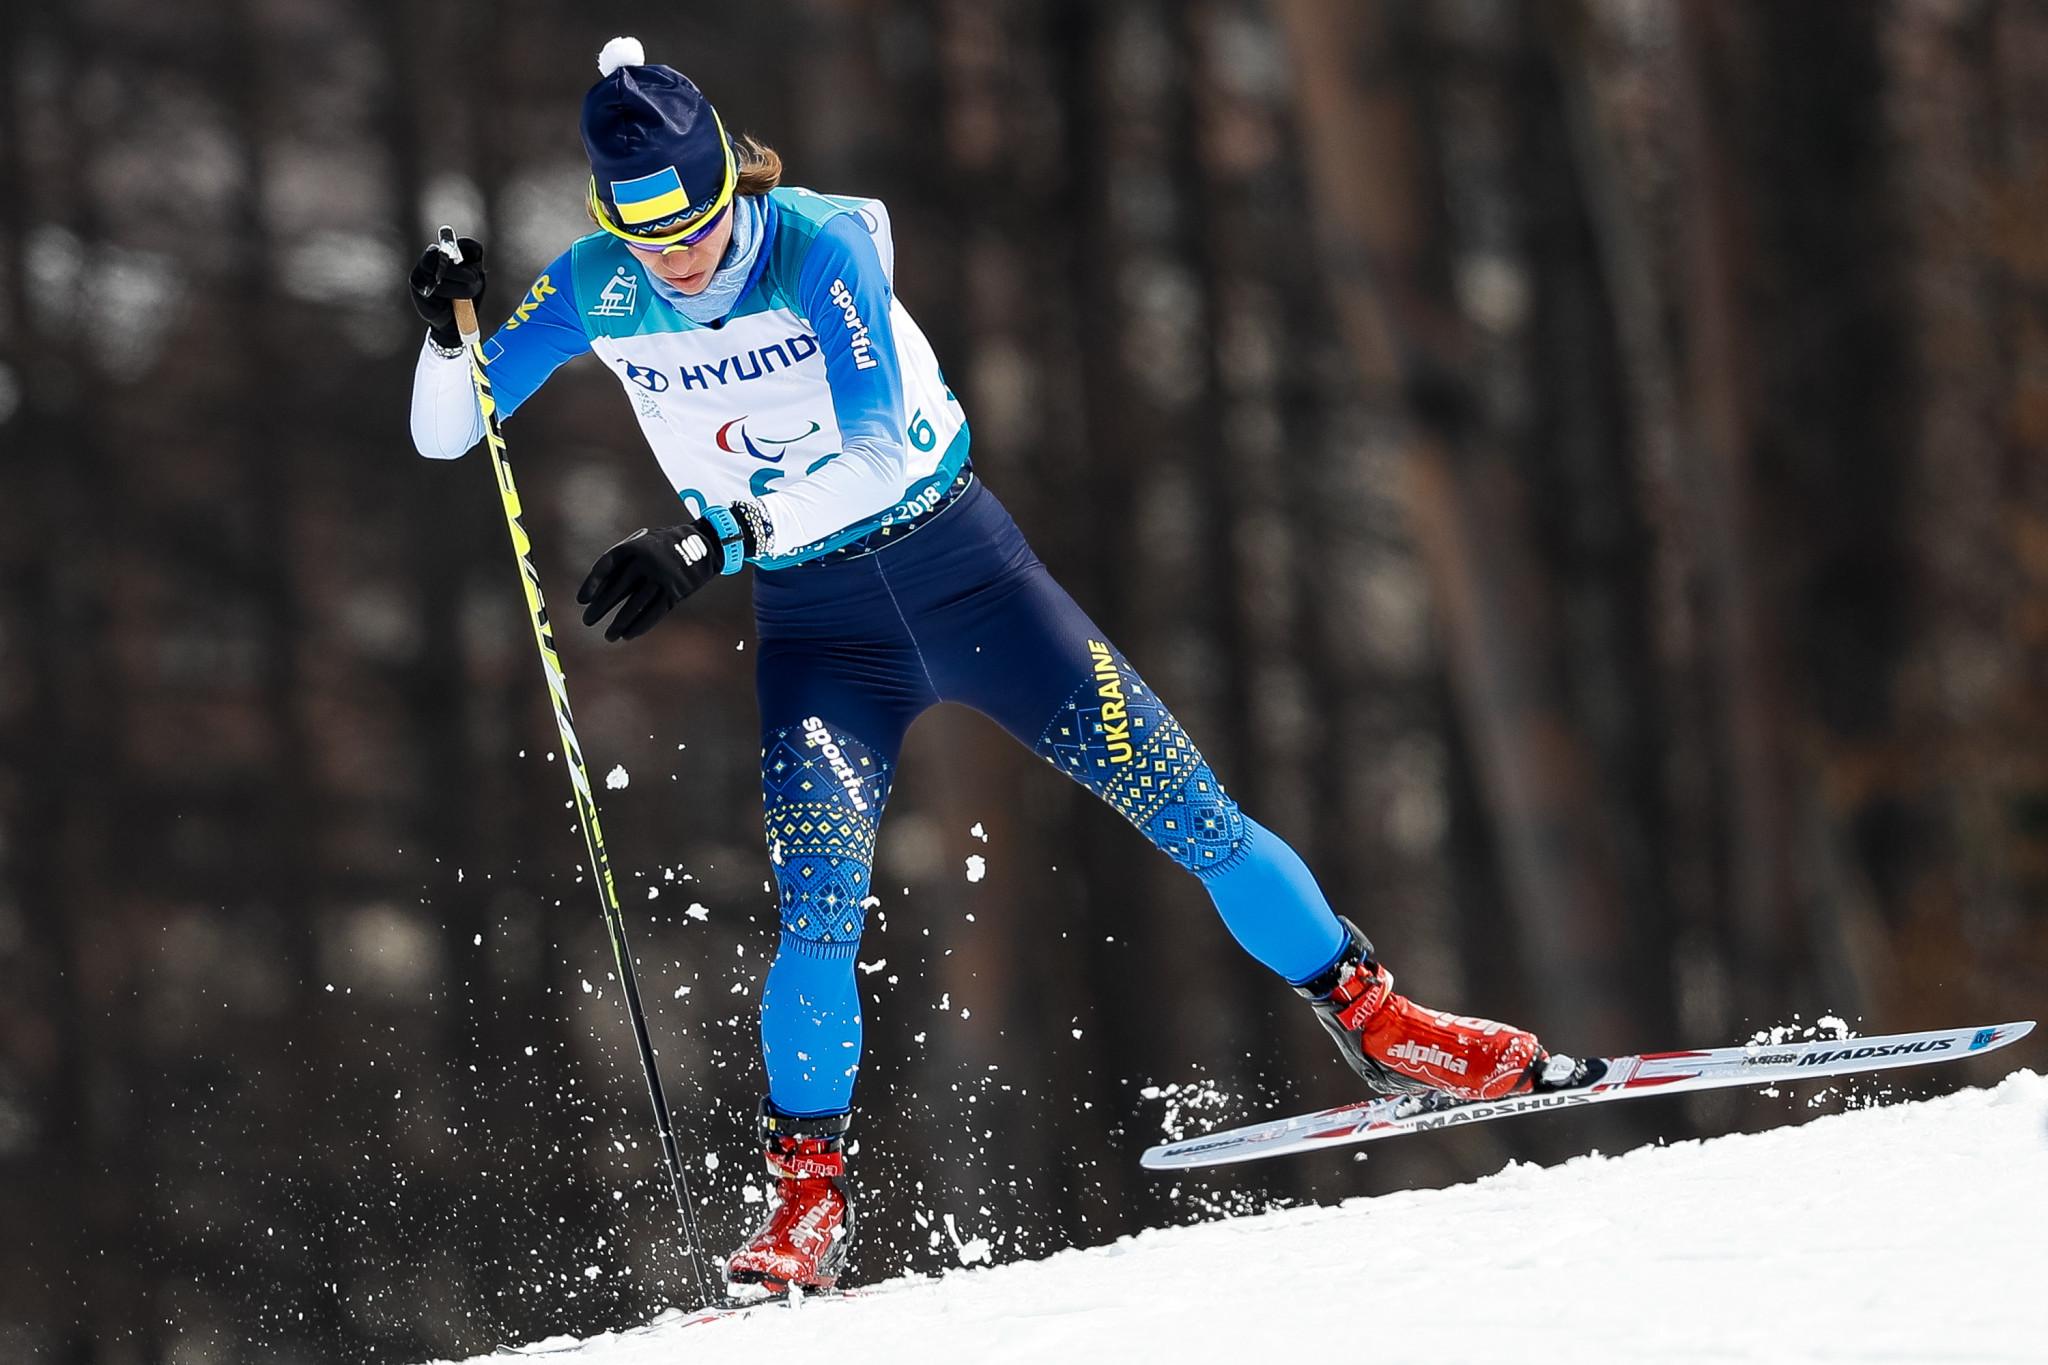 Liudmyla Liashenko won the the women's 6km biathlon standing final in Vuokatti ©Getty Images